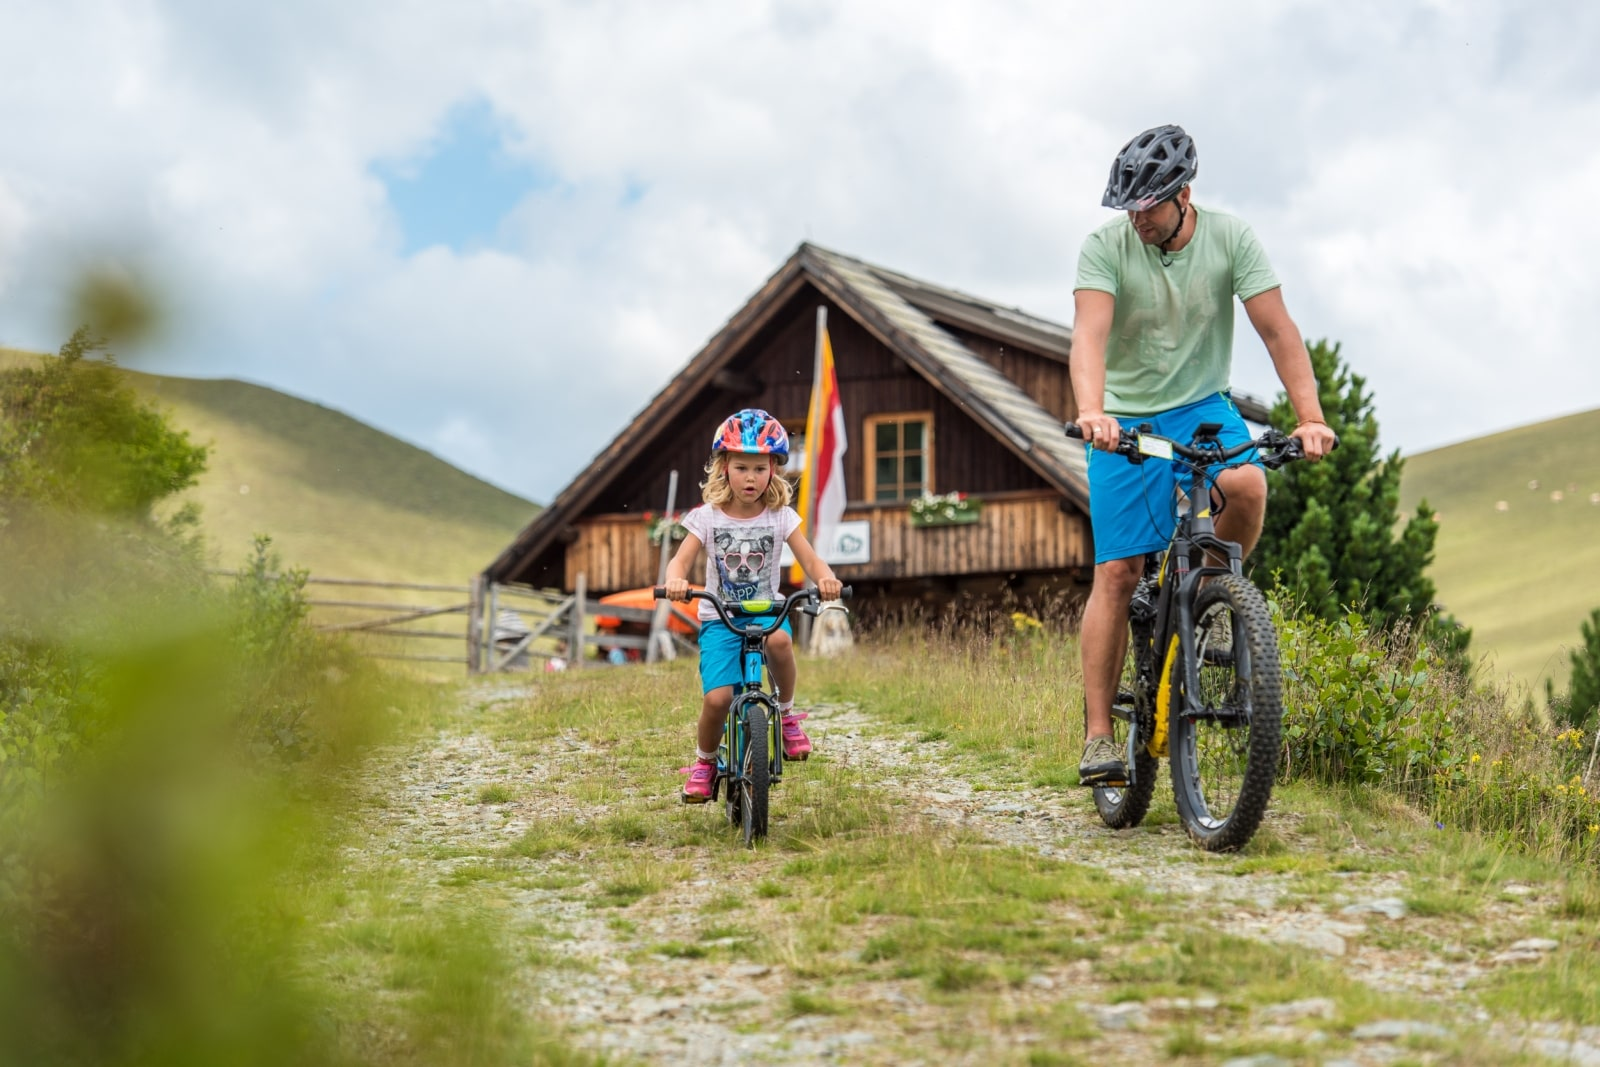 Heidi-Chalet-Falkert-Heidialm-Natur-See-Biken-Fahrrad-Kinder-Zirbenhuette